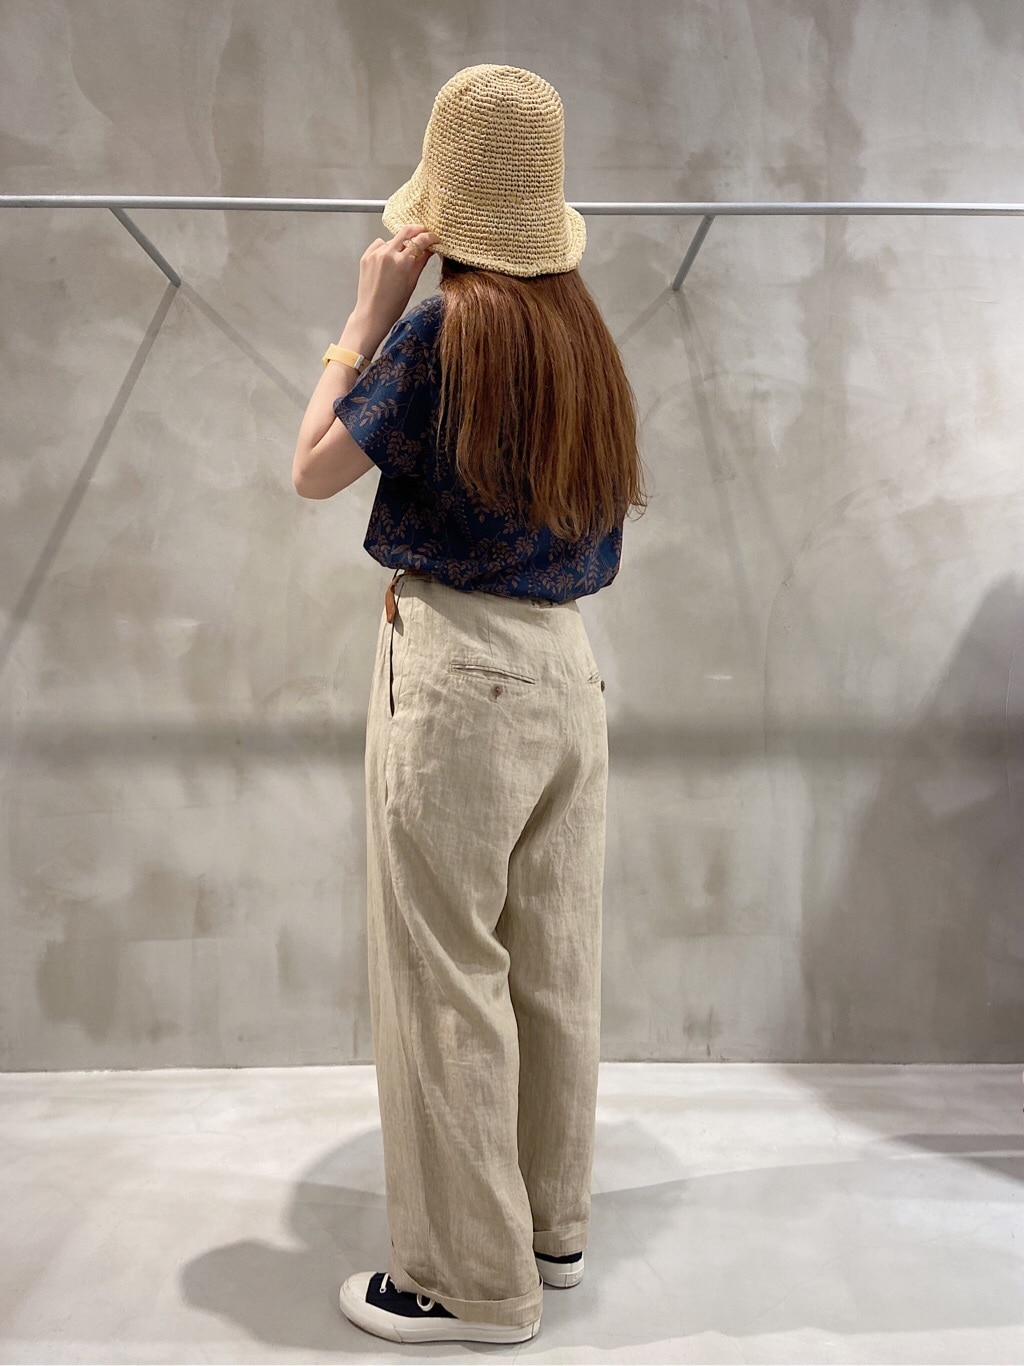 bulle de savon 渋谷スクランブルスクエア 身長:160cm 2020.06.05